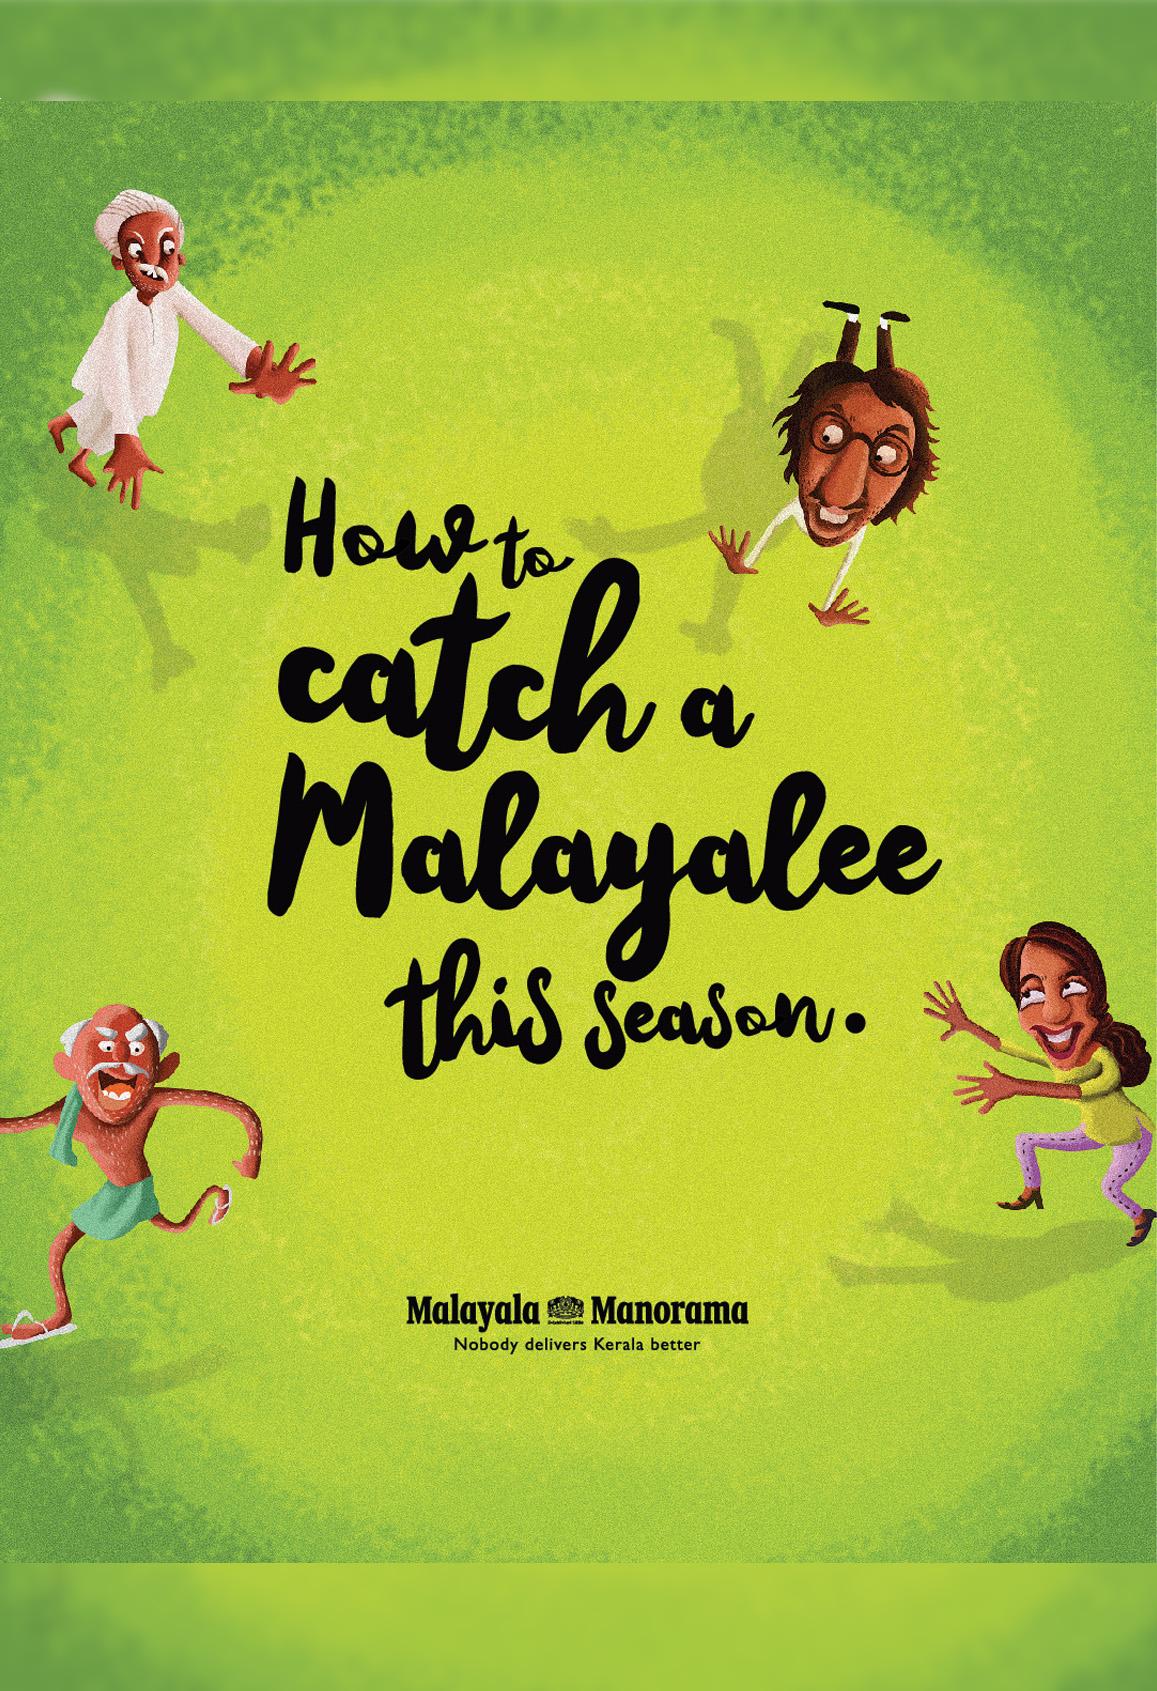 How to Catch a Malayalee by Malayala Manorama   Print mock-up 5 by Stark Communications Pvt Ltd